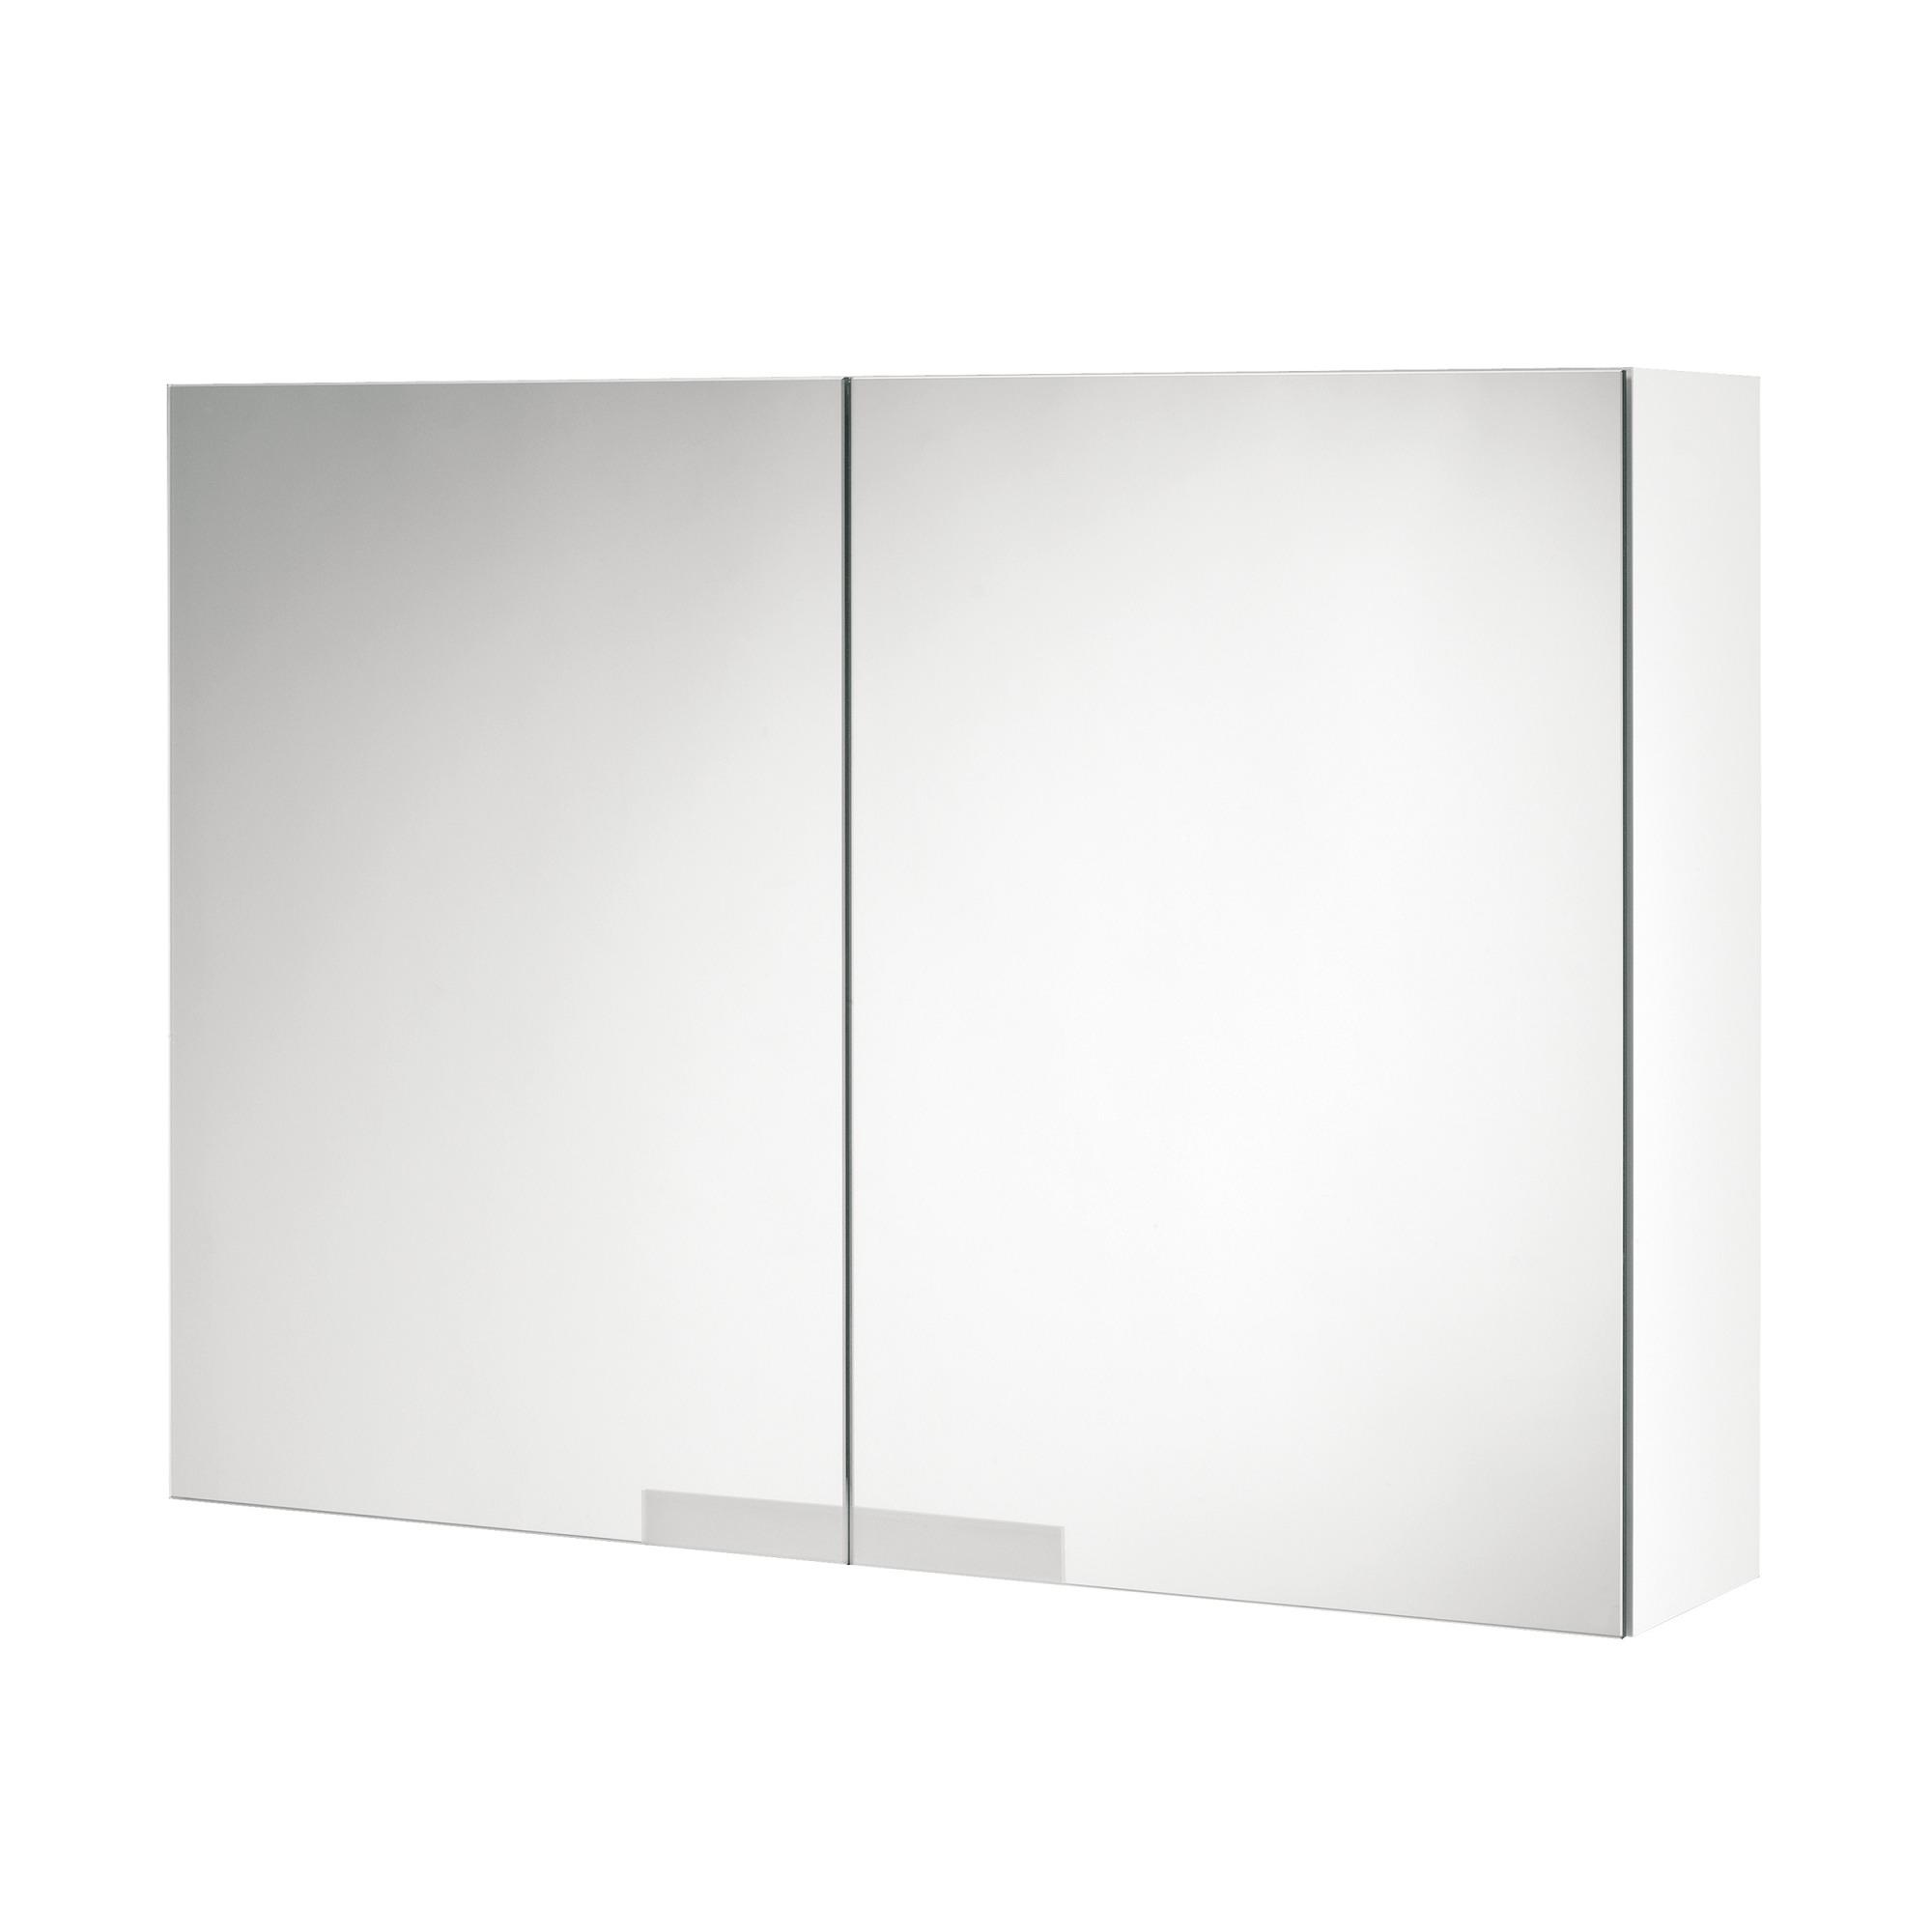 Tiger Items spiegelkast 70 x 50 cm, wit hoogglans